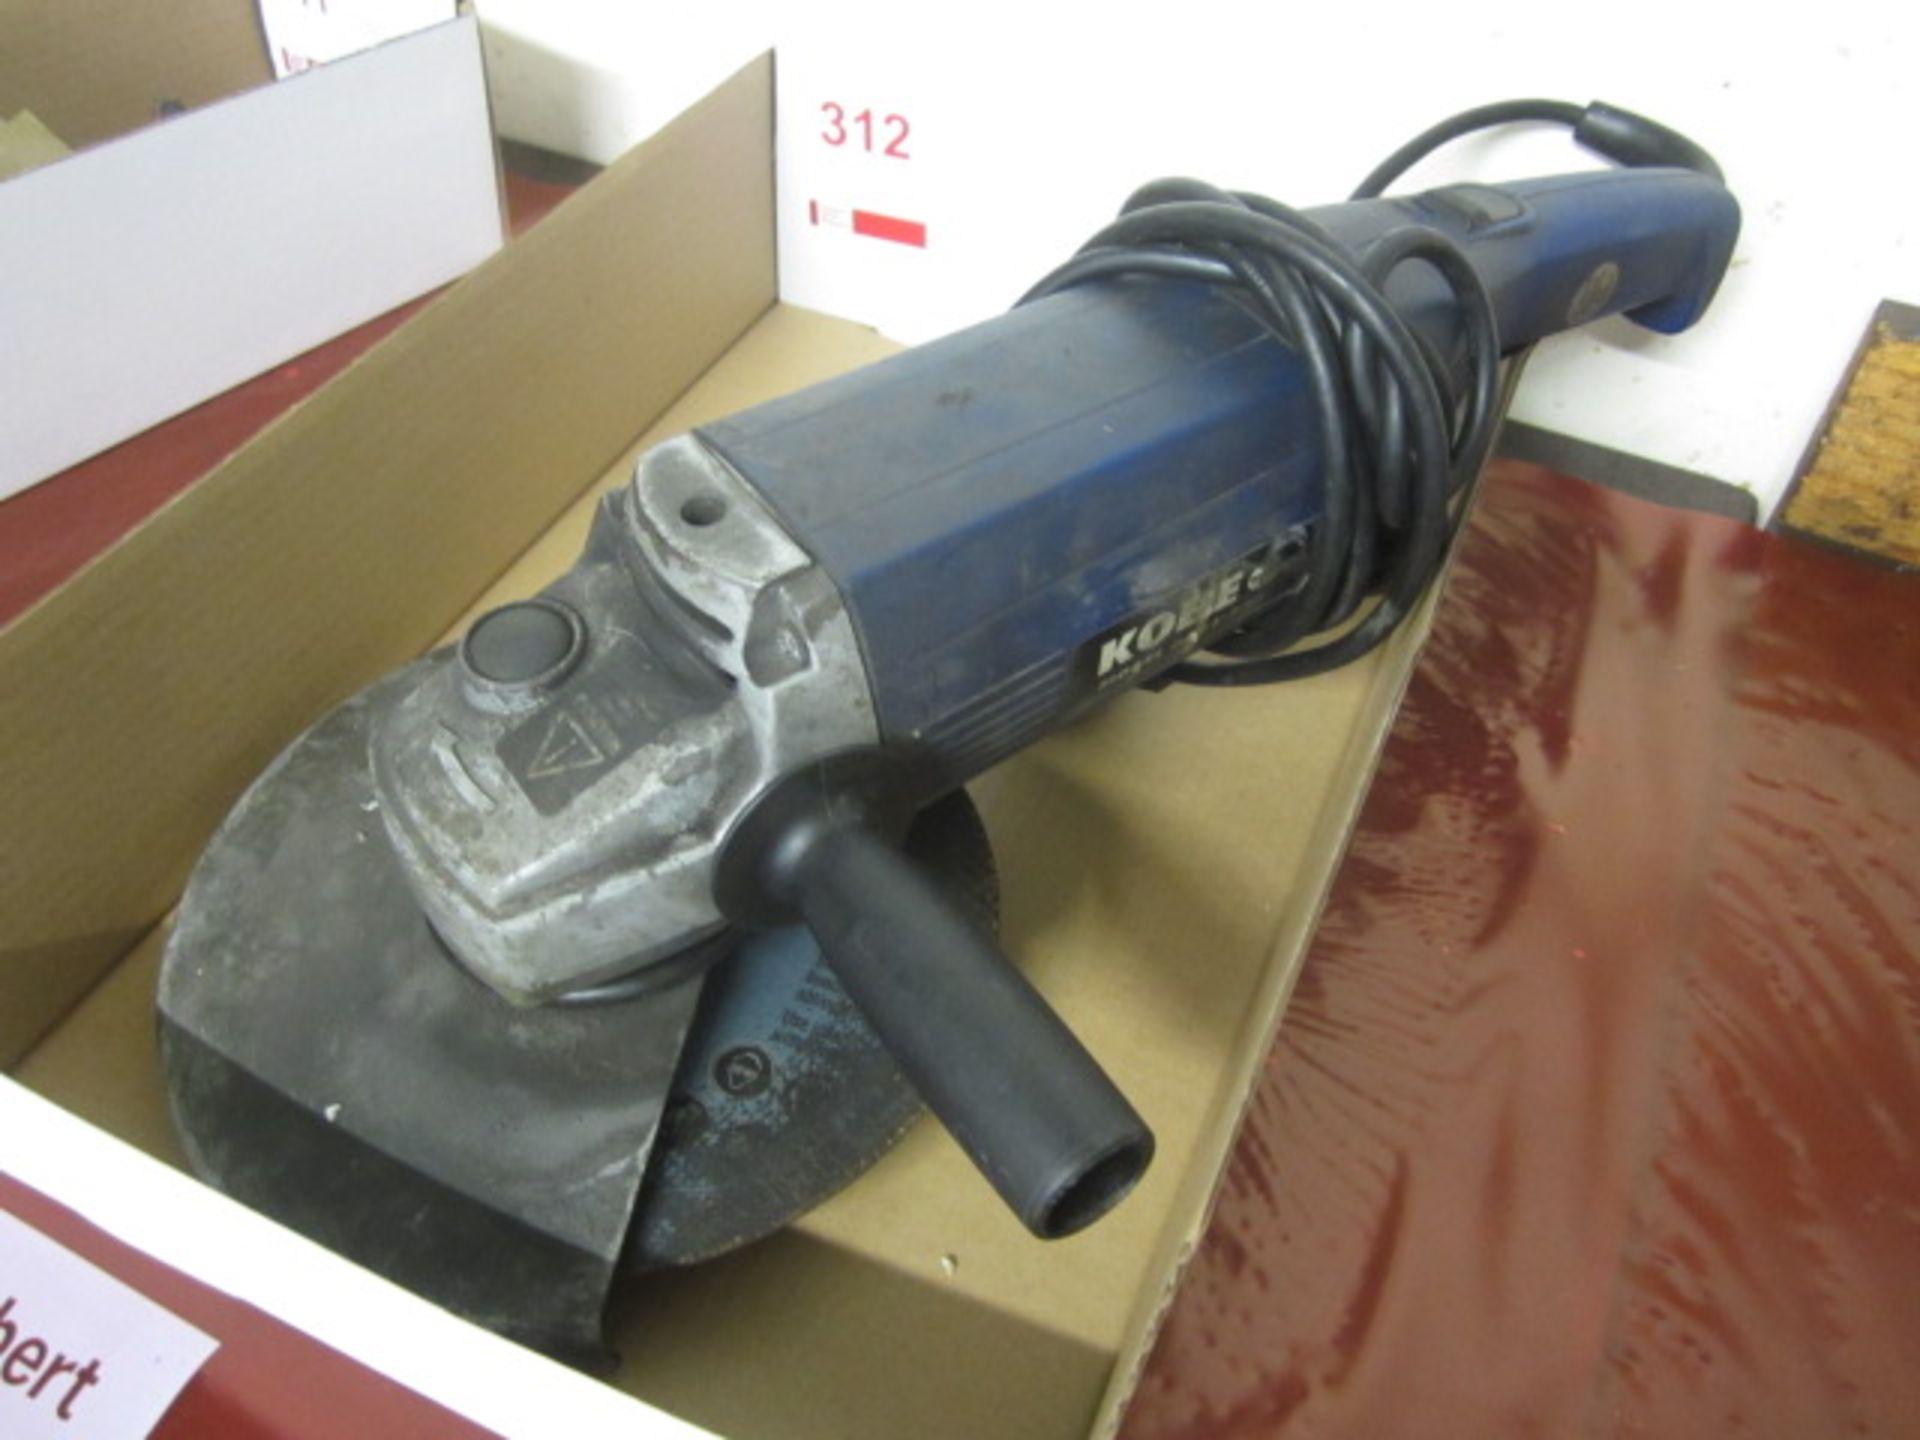 Lot 312 - Kobe GA21-230, 240v angle grinder